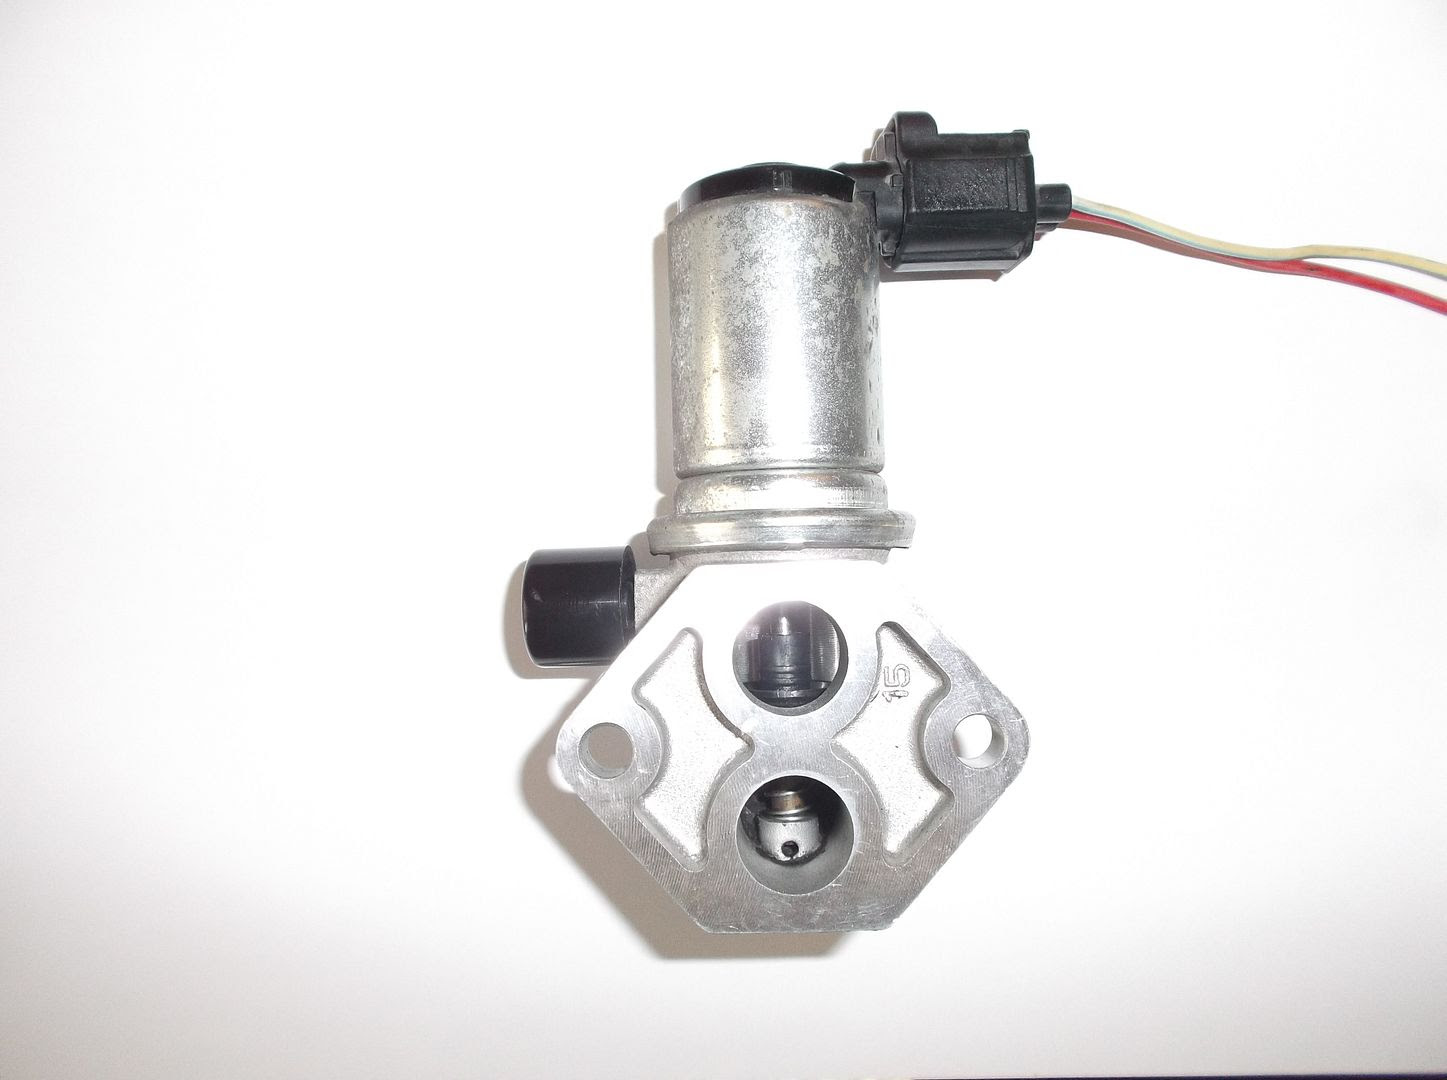 Iac Solenoid Wiring Diagram